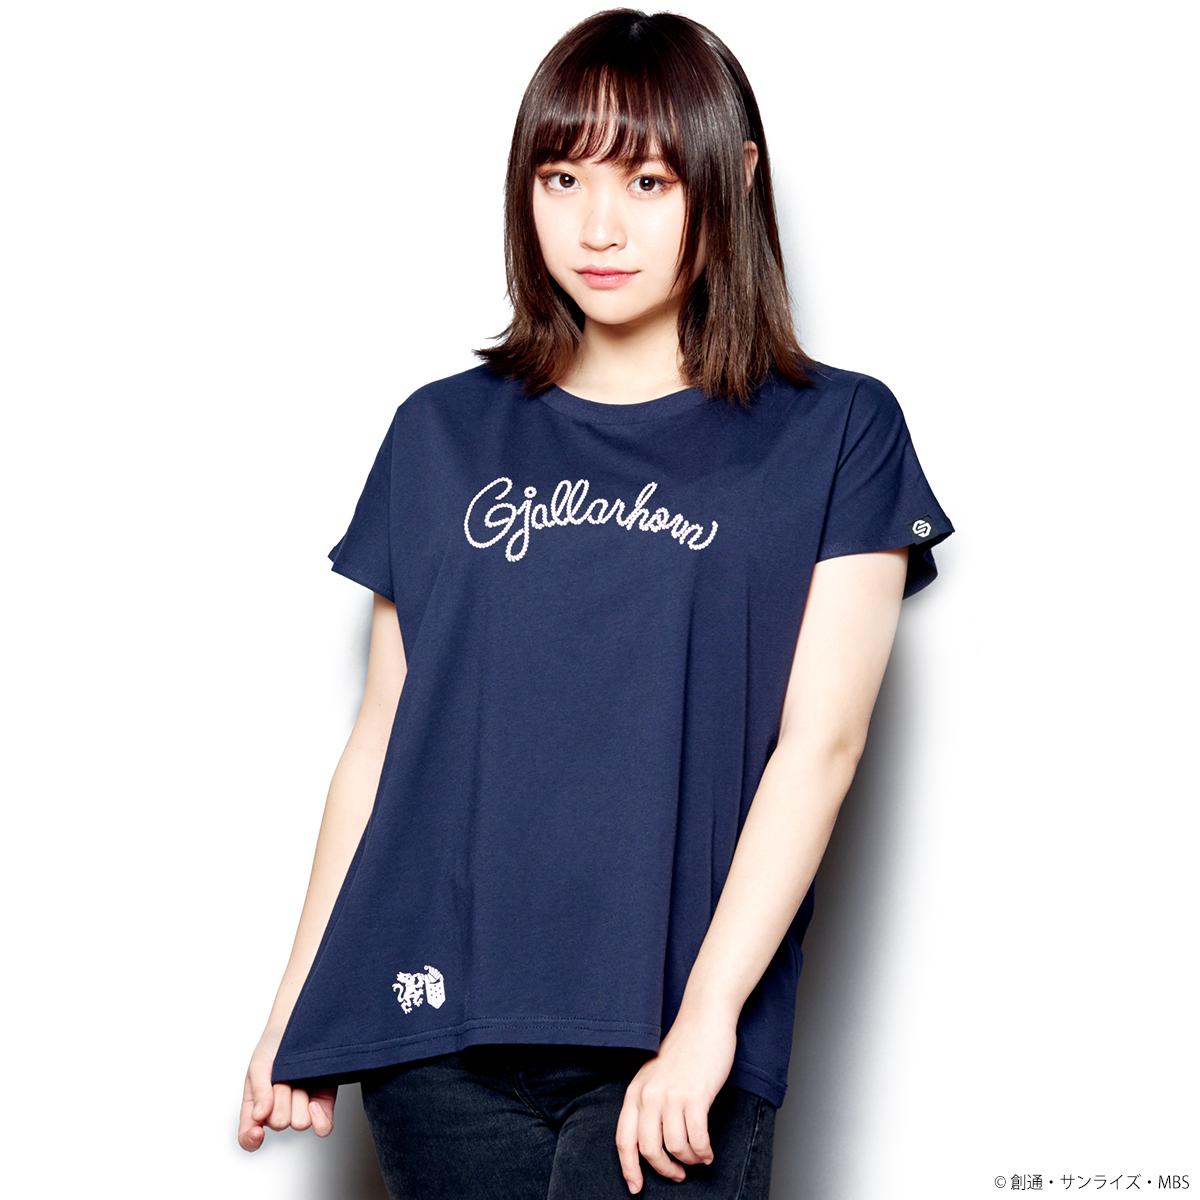 STRICT-G『機動戦士ガンダム 鉄血のオルフェンズ』 フレンチTシャツ ギャラルホルン